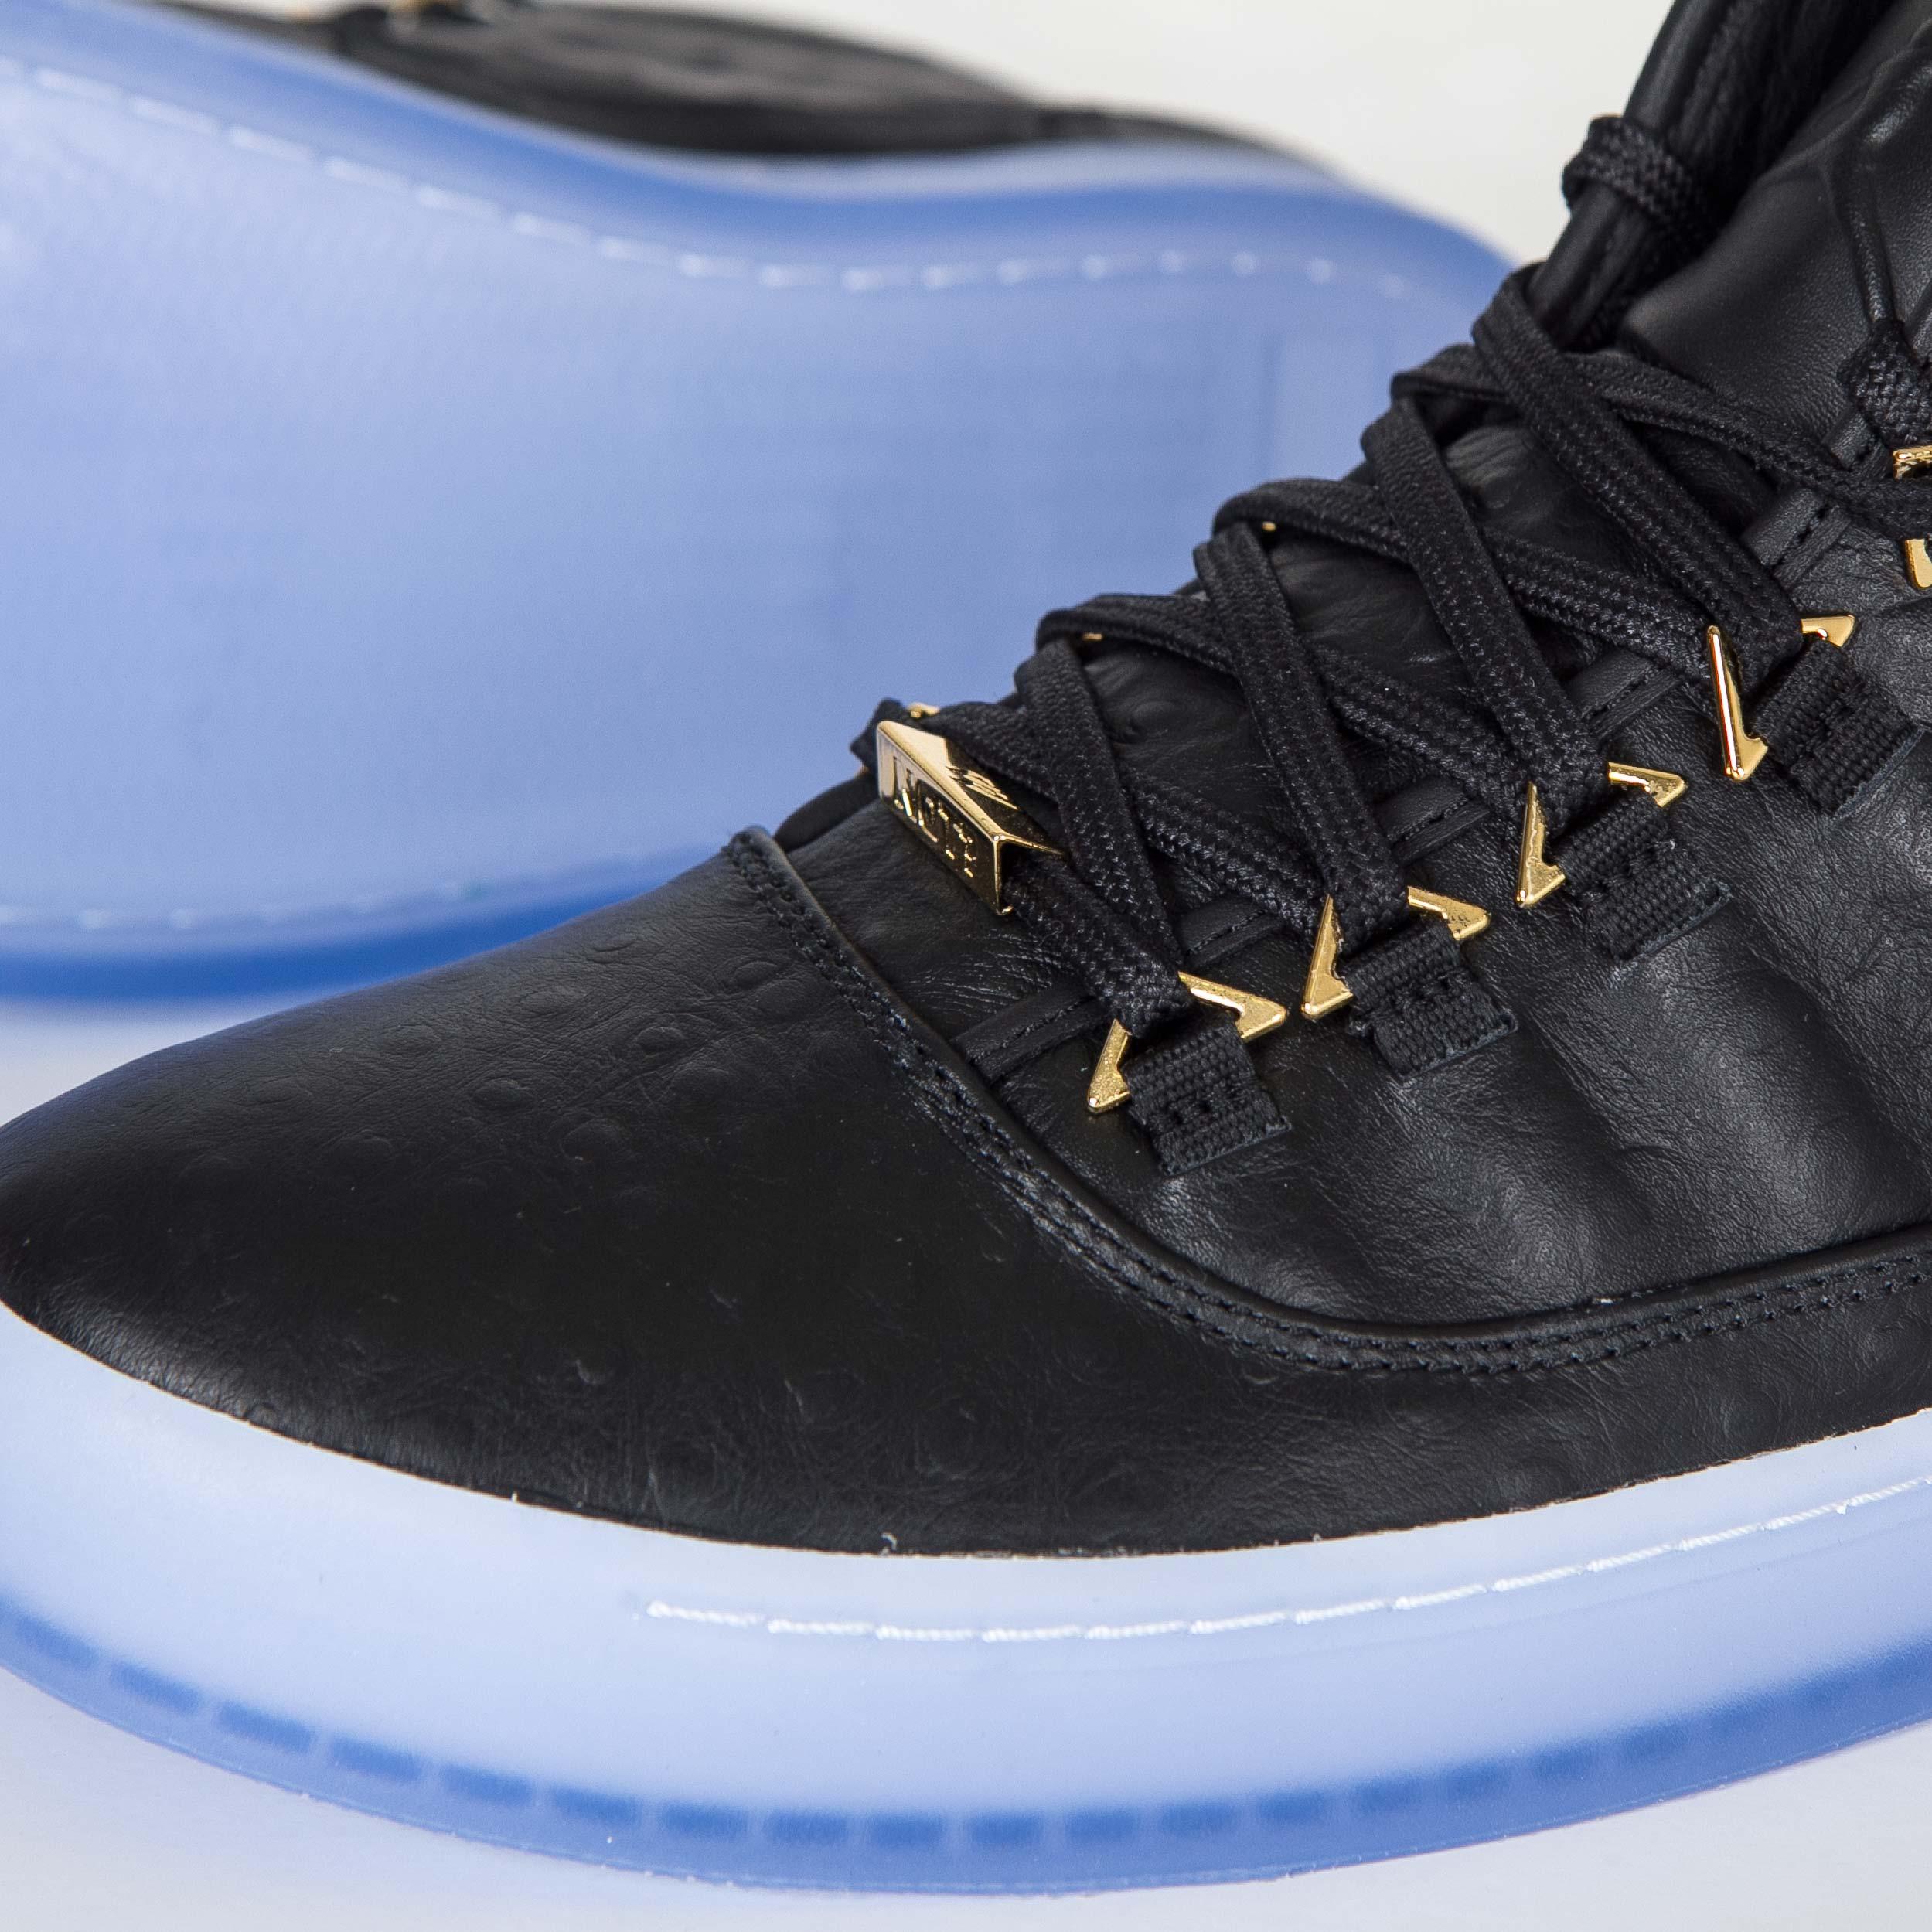 watch 01ab2 2d44d Jordan Brand Jordan Westbrook 0 Premium - 6. Close